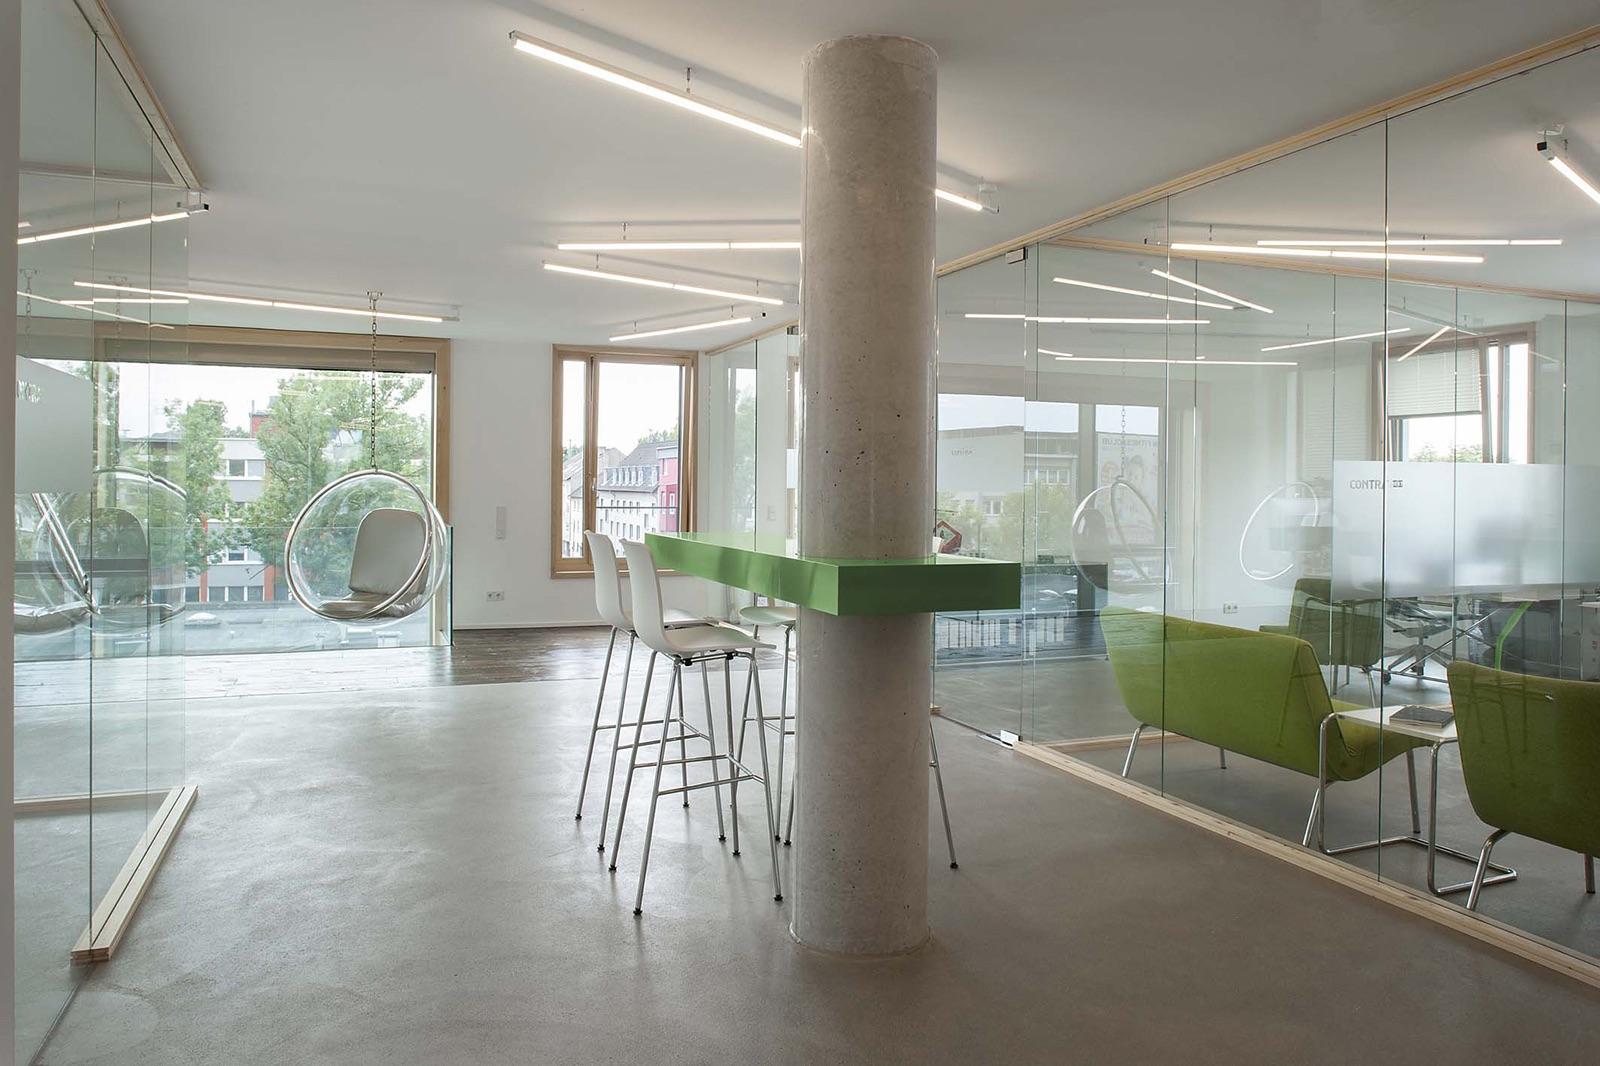 contra-bochum-office-6